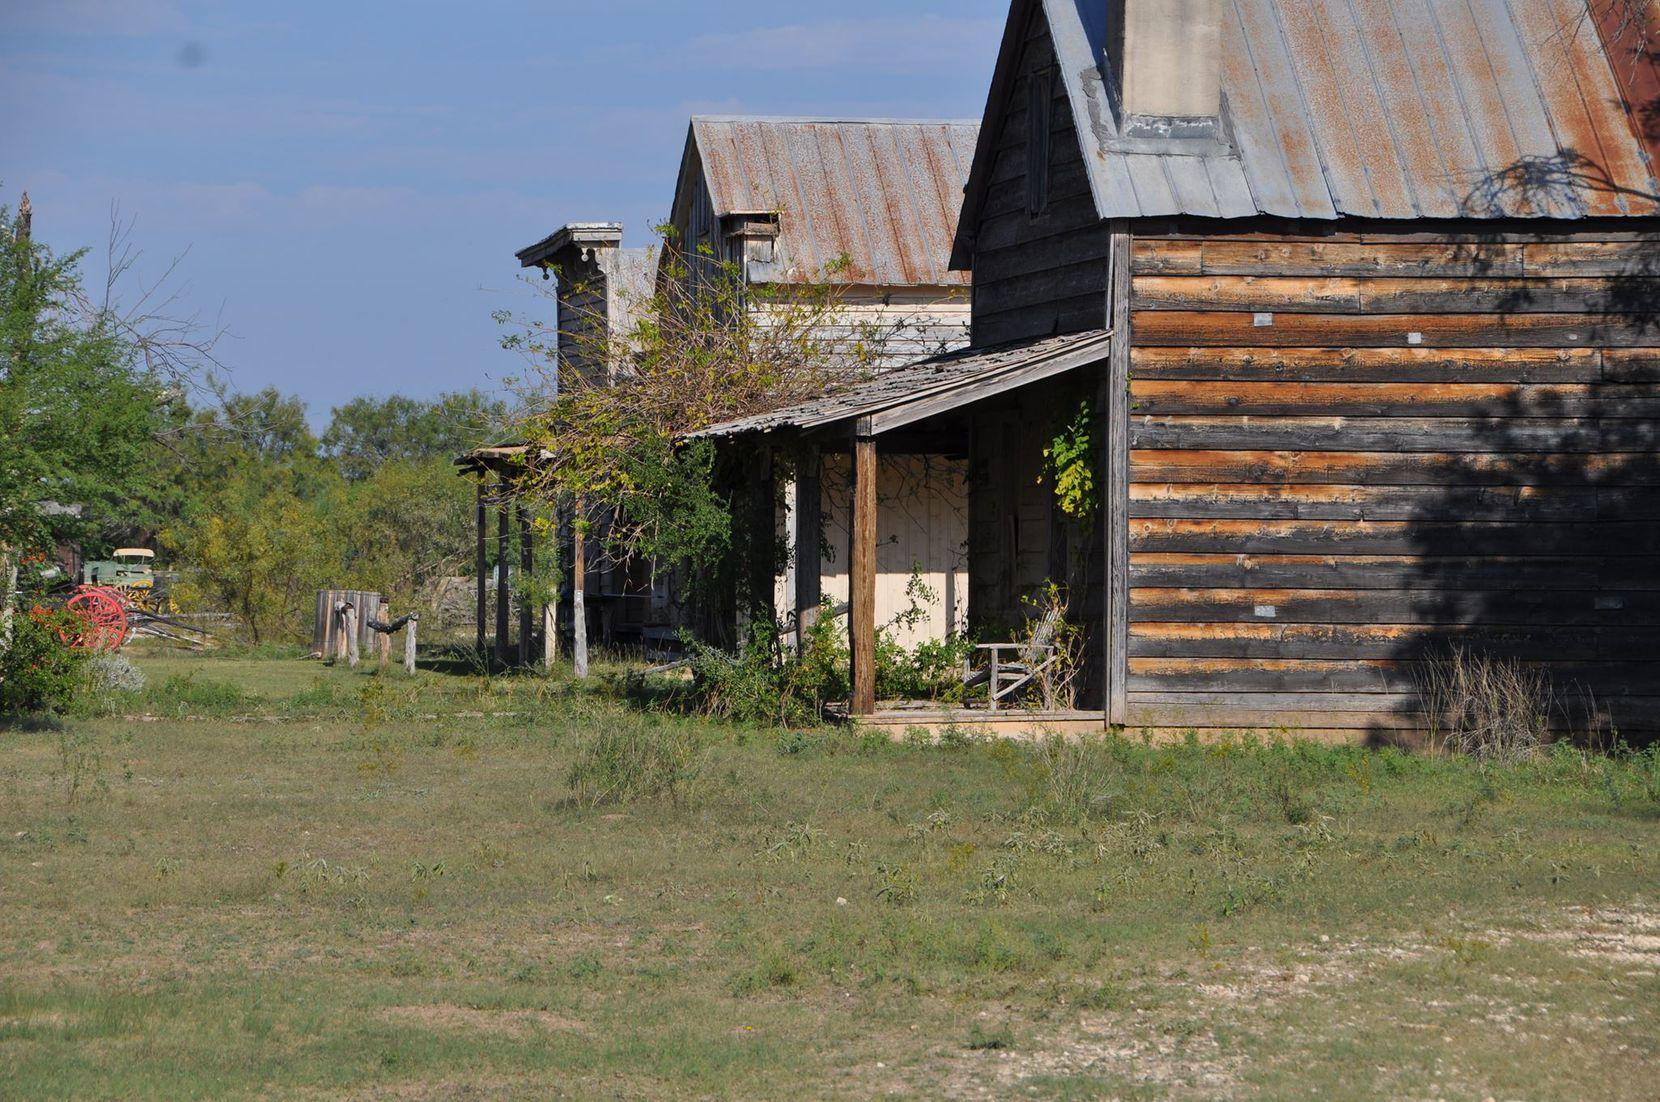 Deteriorating buildings at the Alamo Village site.